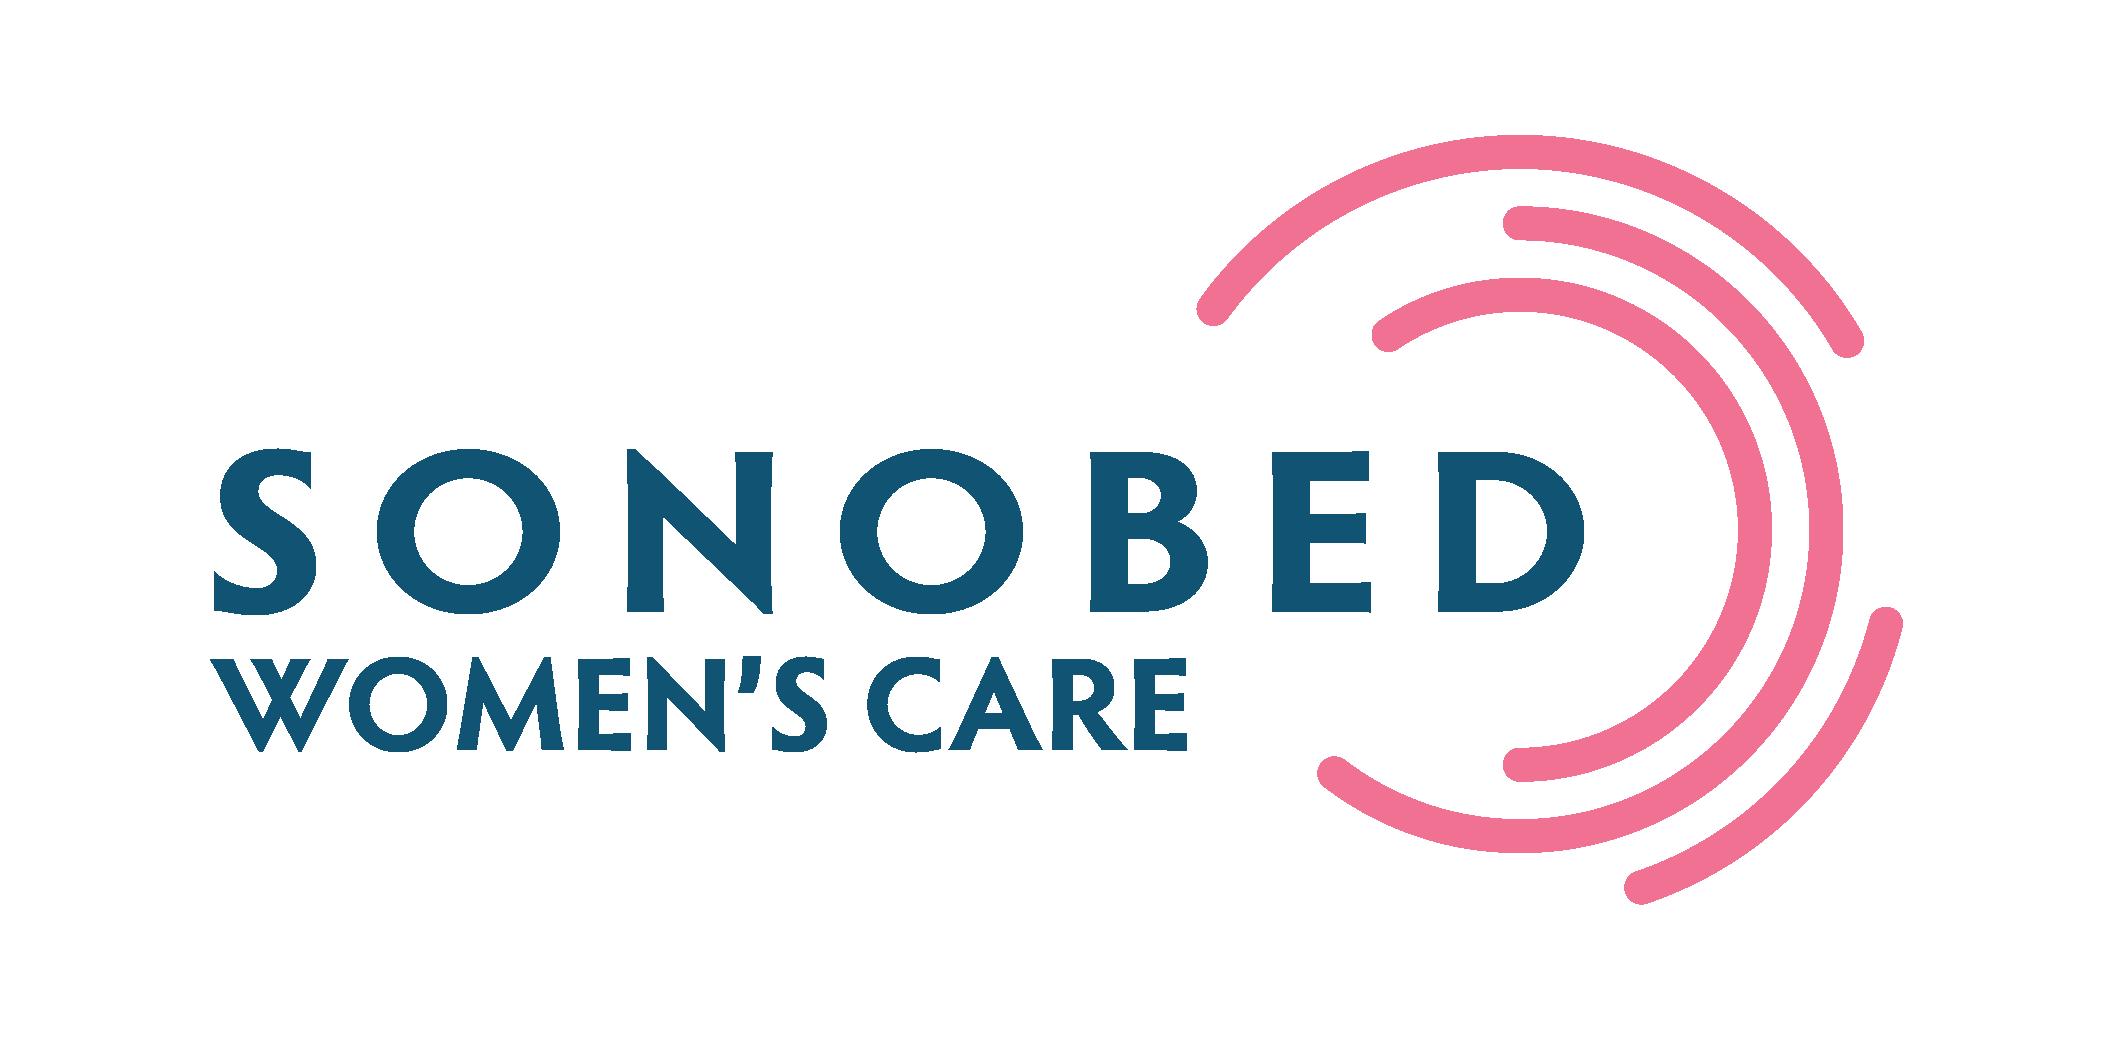 Women's Care